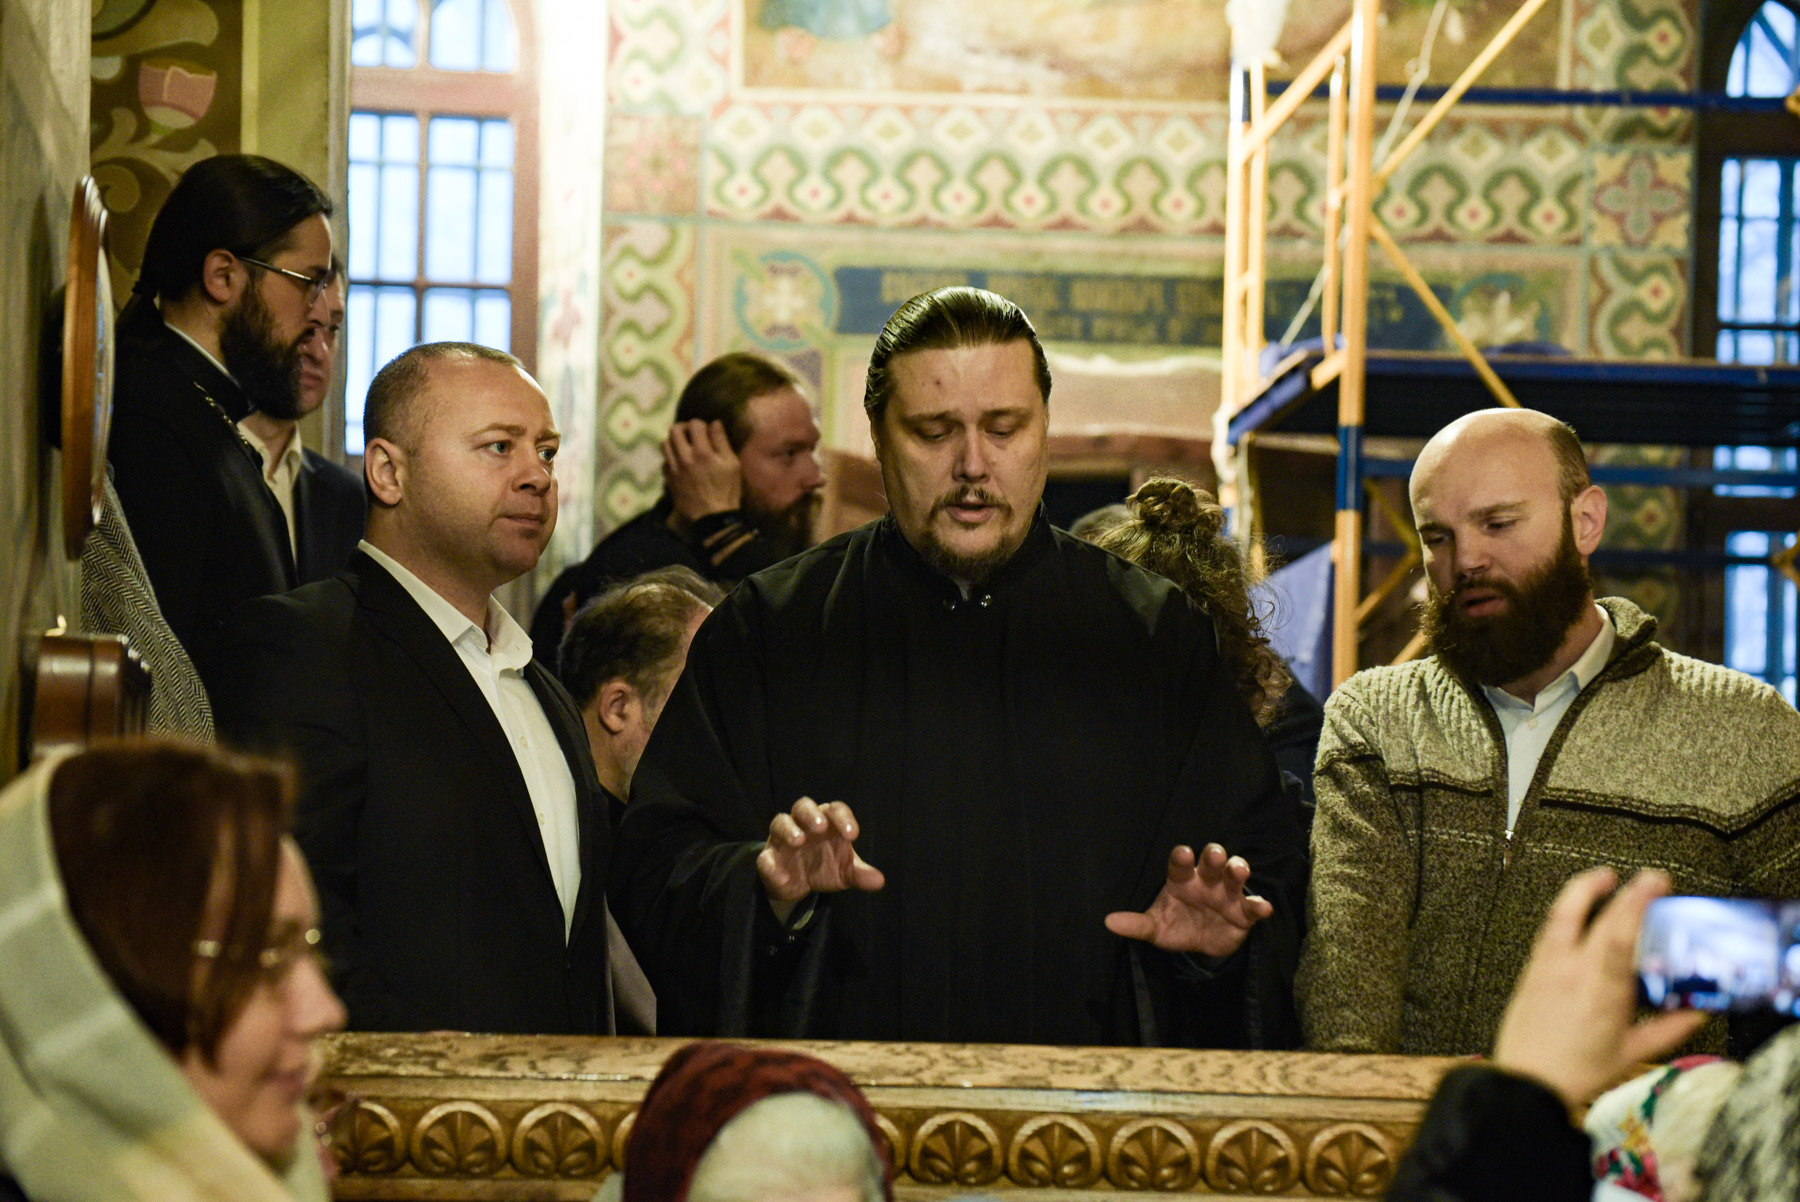 photos of orthodox christmas 0102 2